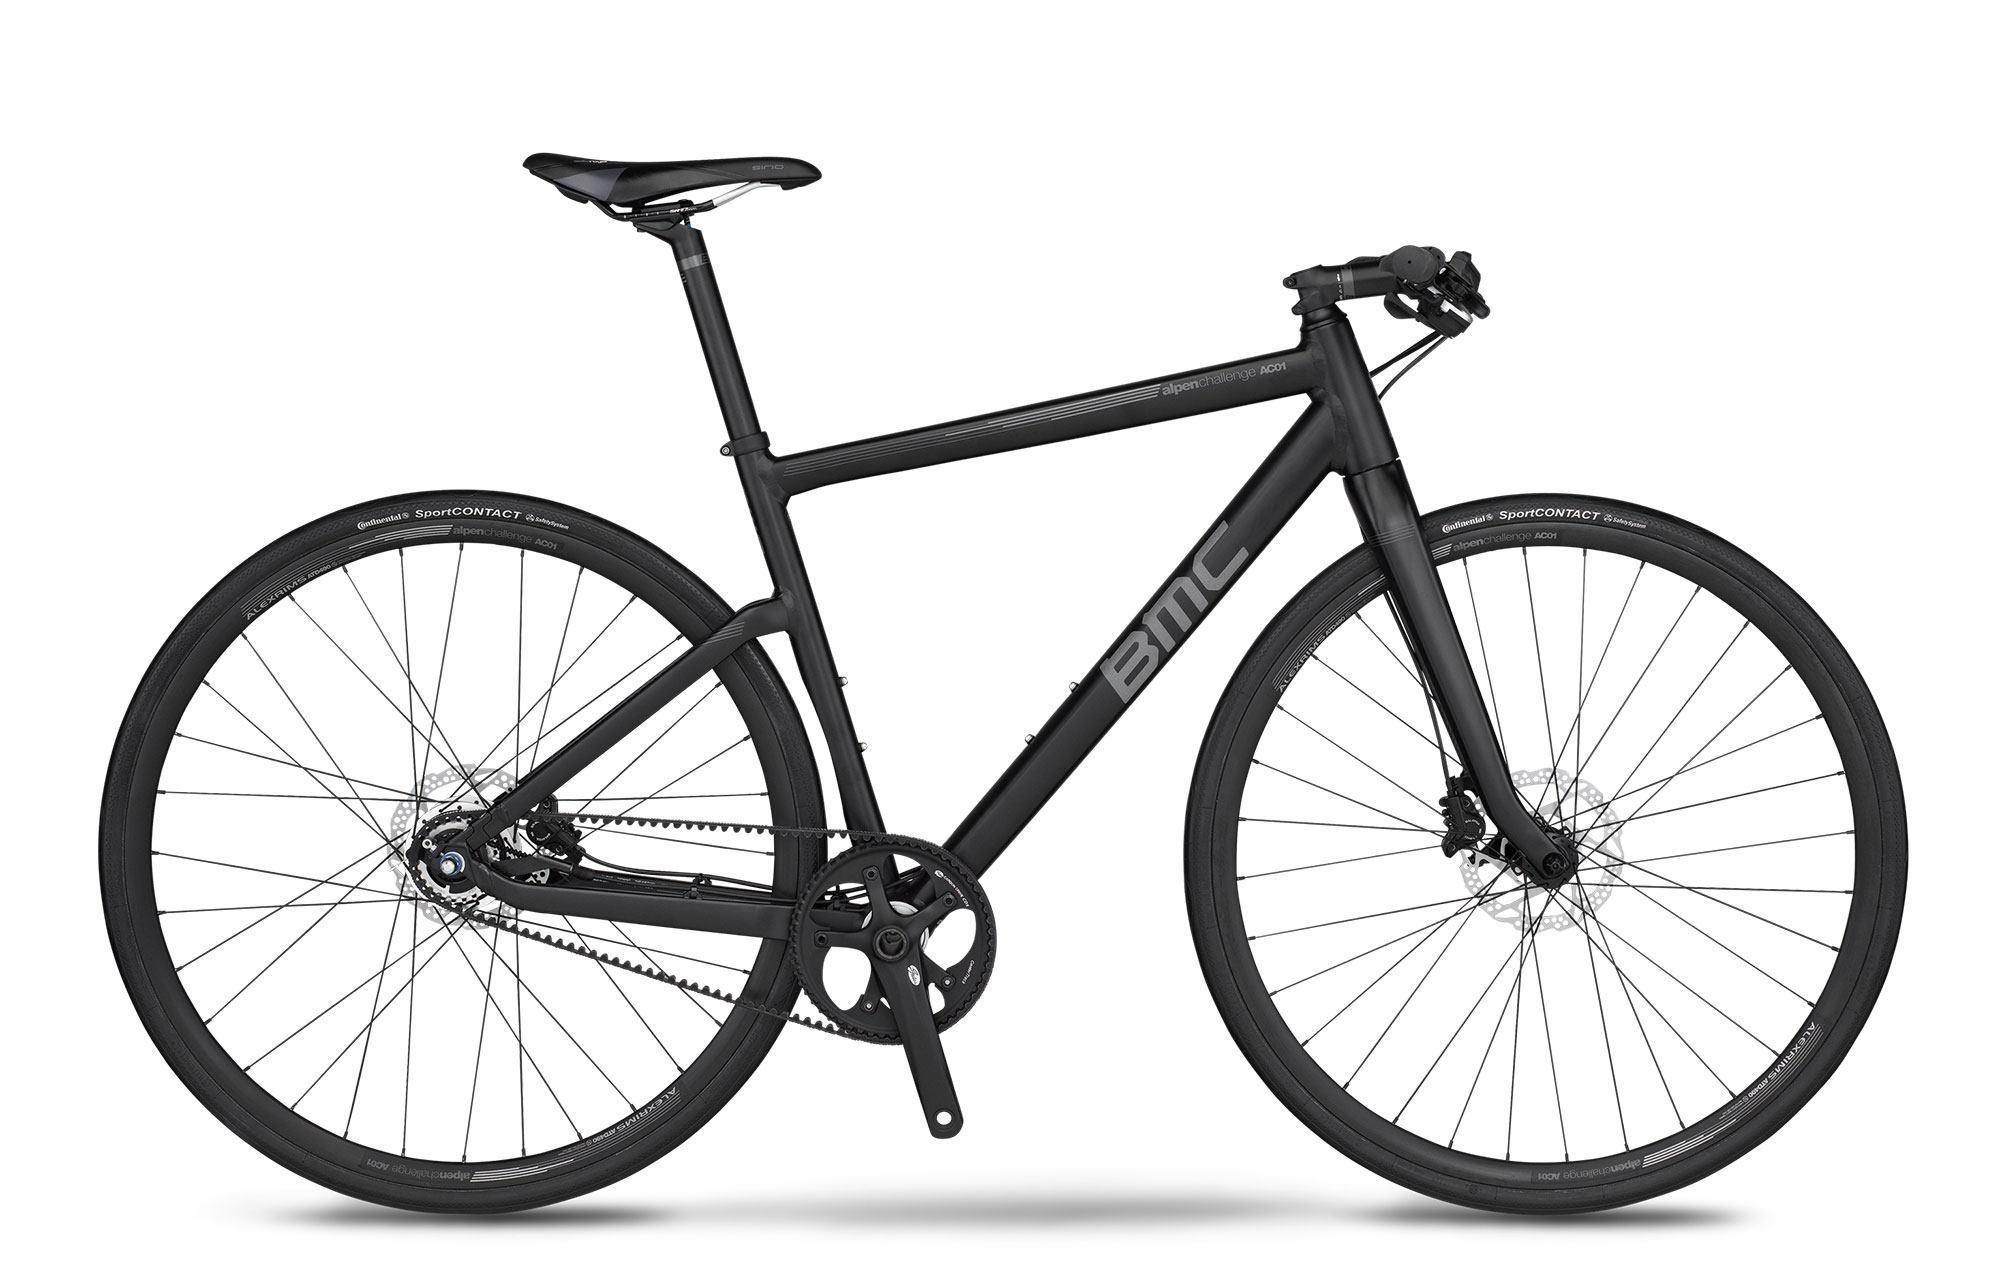 2015 Bmc Alpenchallenge Ac01 Igh Alfine 8 Bike R A Cycles